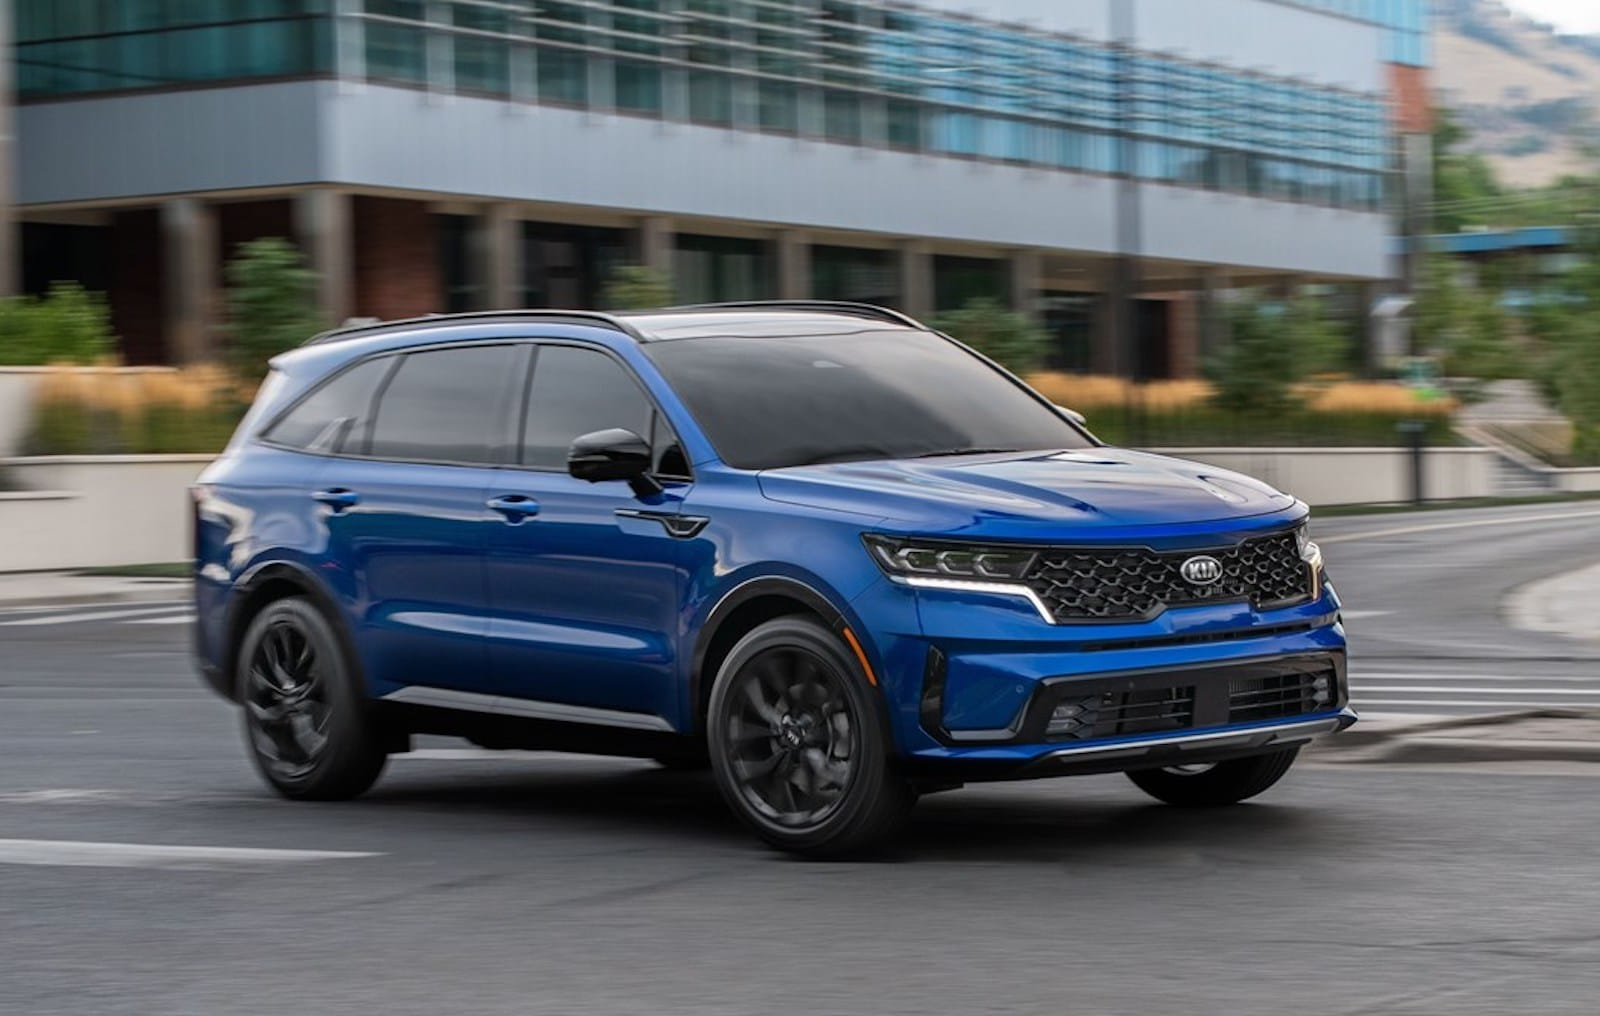 Toyota Takes Four Spots In 2021 Best Cars For The Money List The Detroit Bureau